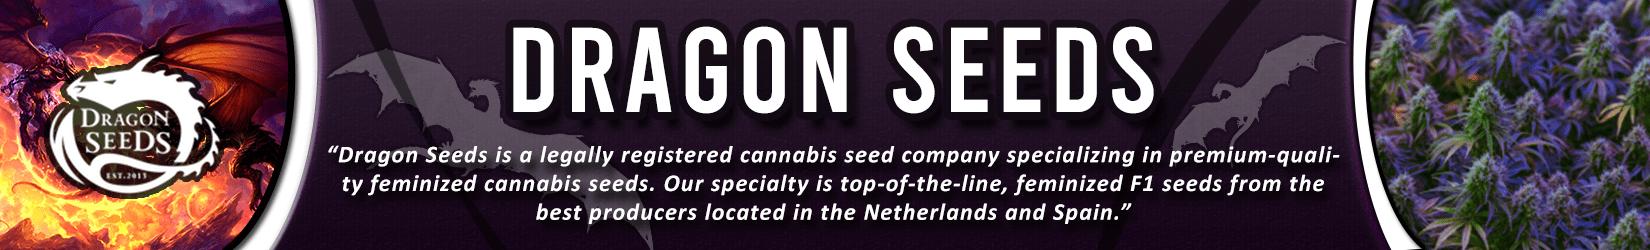 Cannabis Seeds Breeder - Dragon Seeds